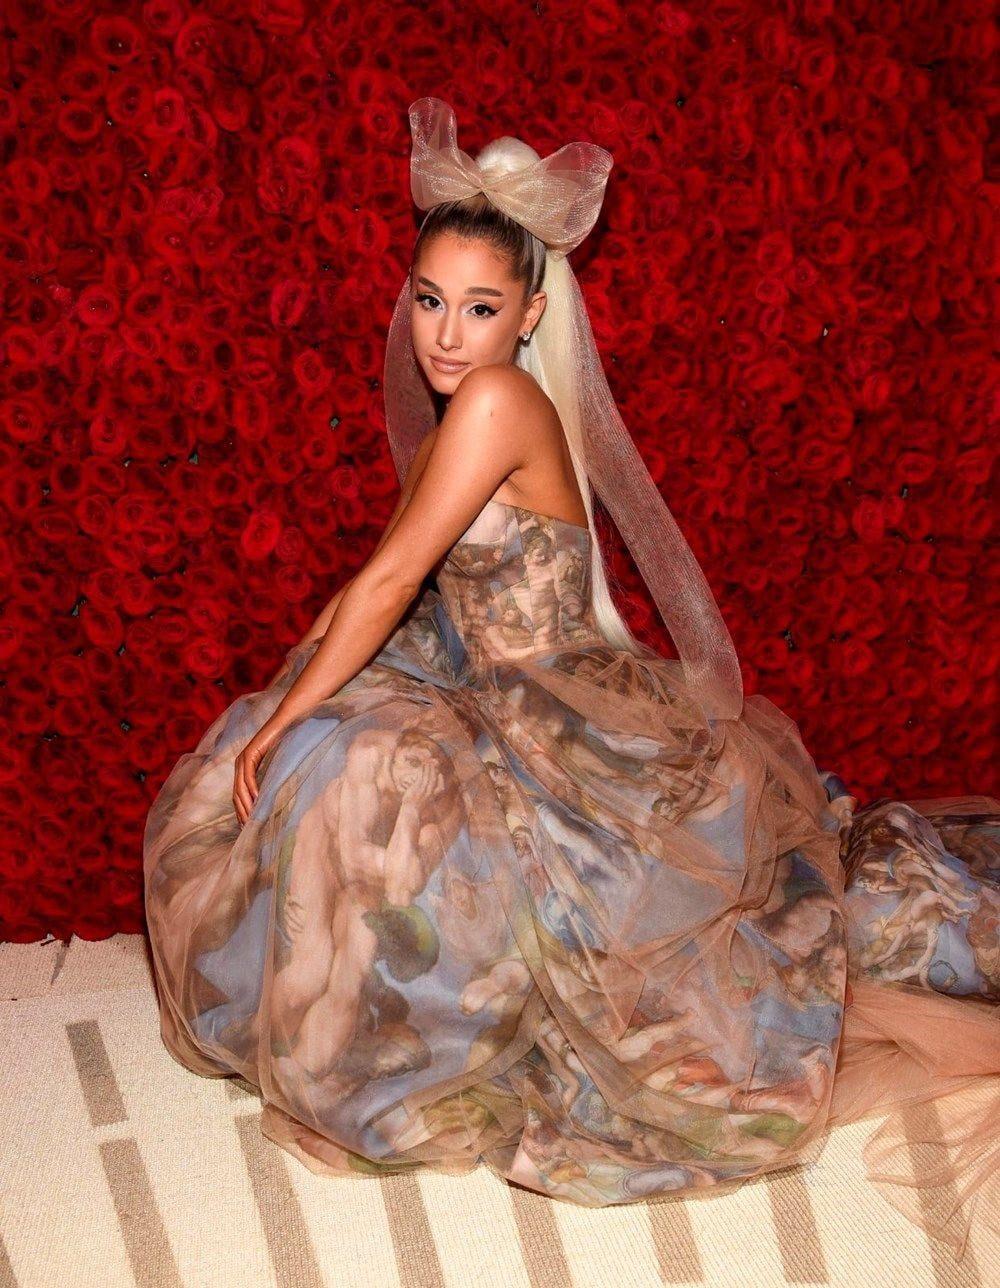 Ariana Grande secretly married to Dalton Gomez 1